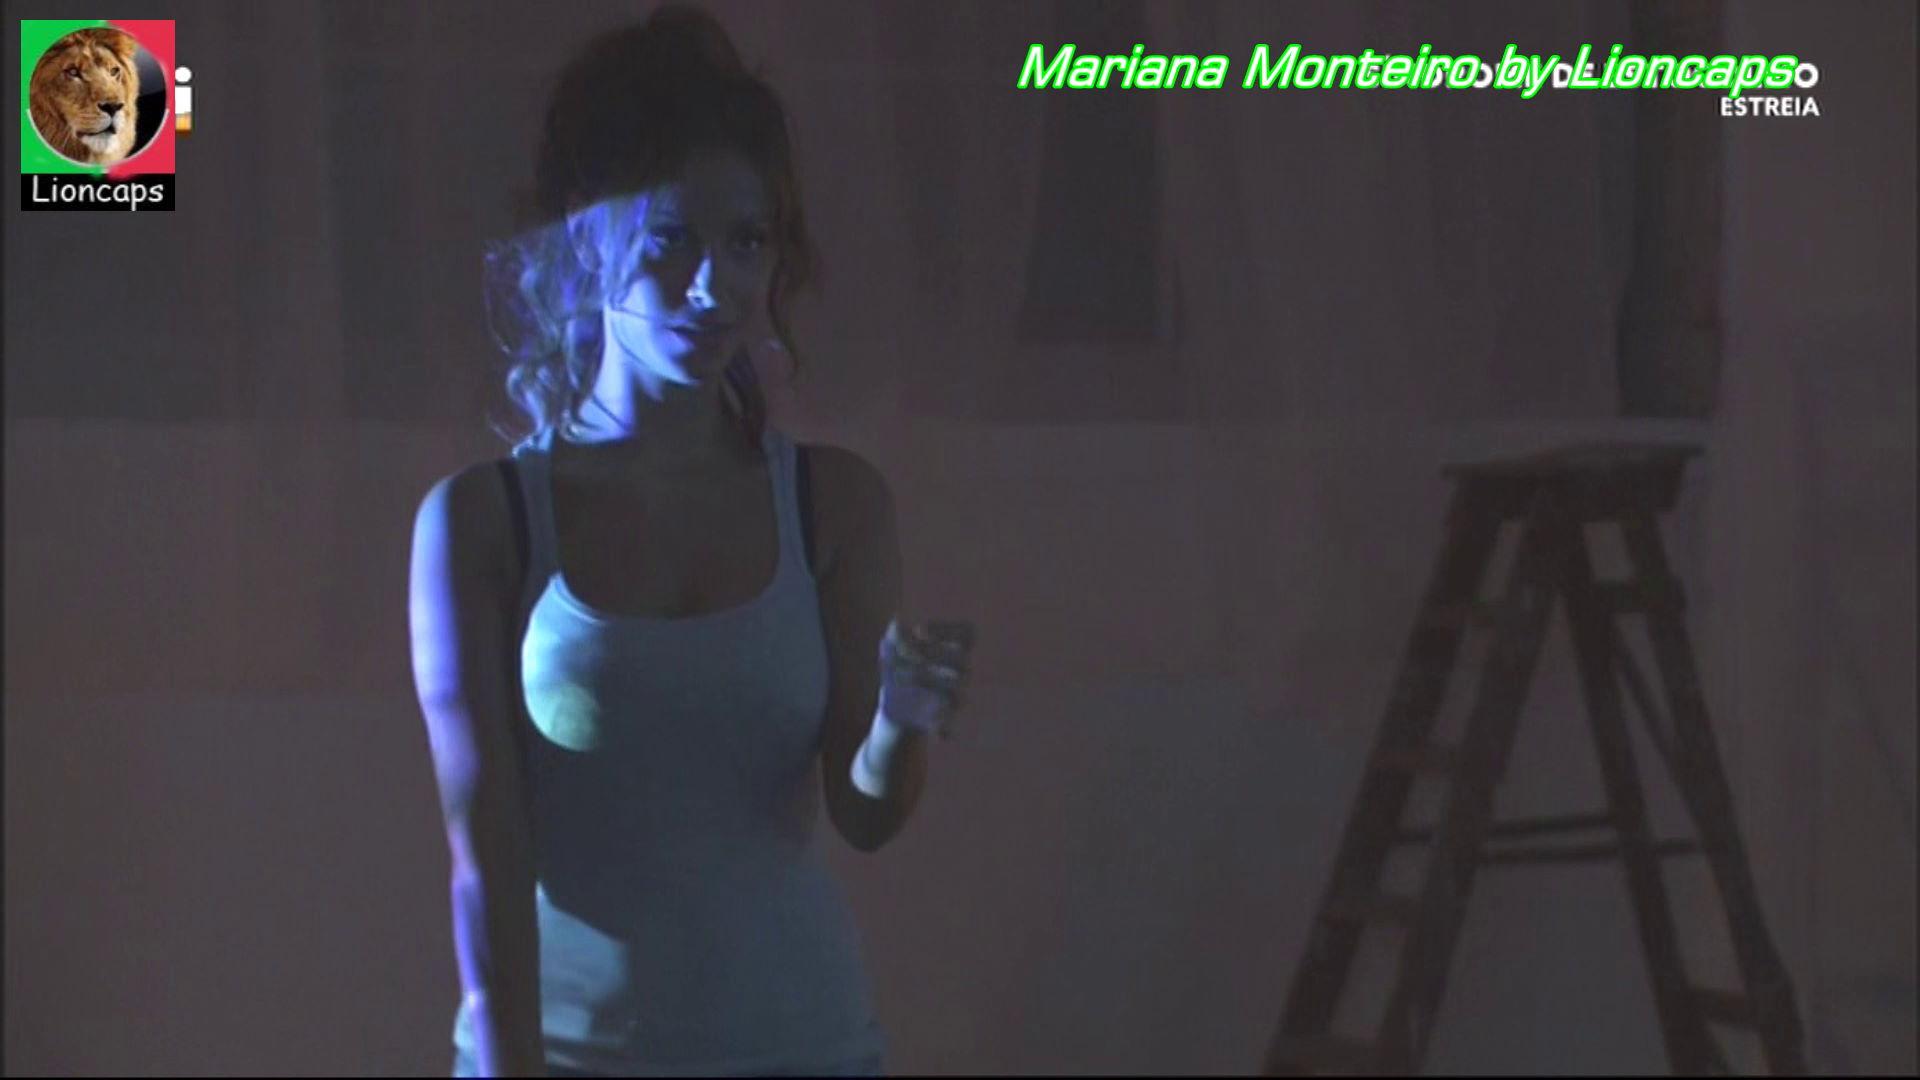 332215893_mariana_monteiro_sindrome_estocolmo_vs180130_0016_122_430lo.JPG